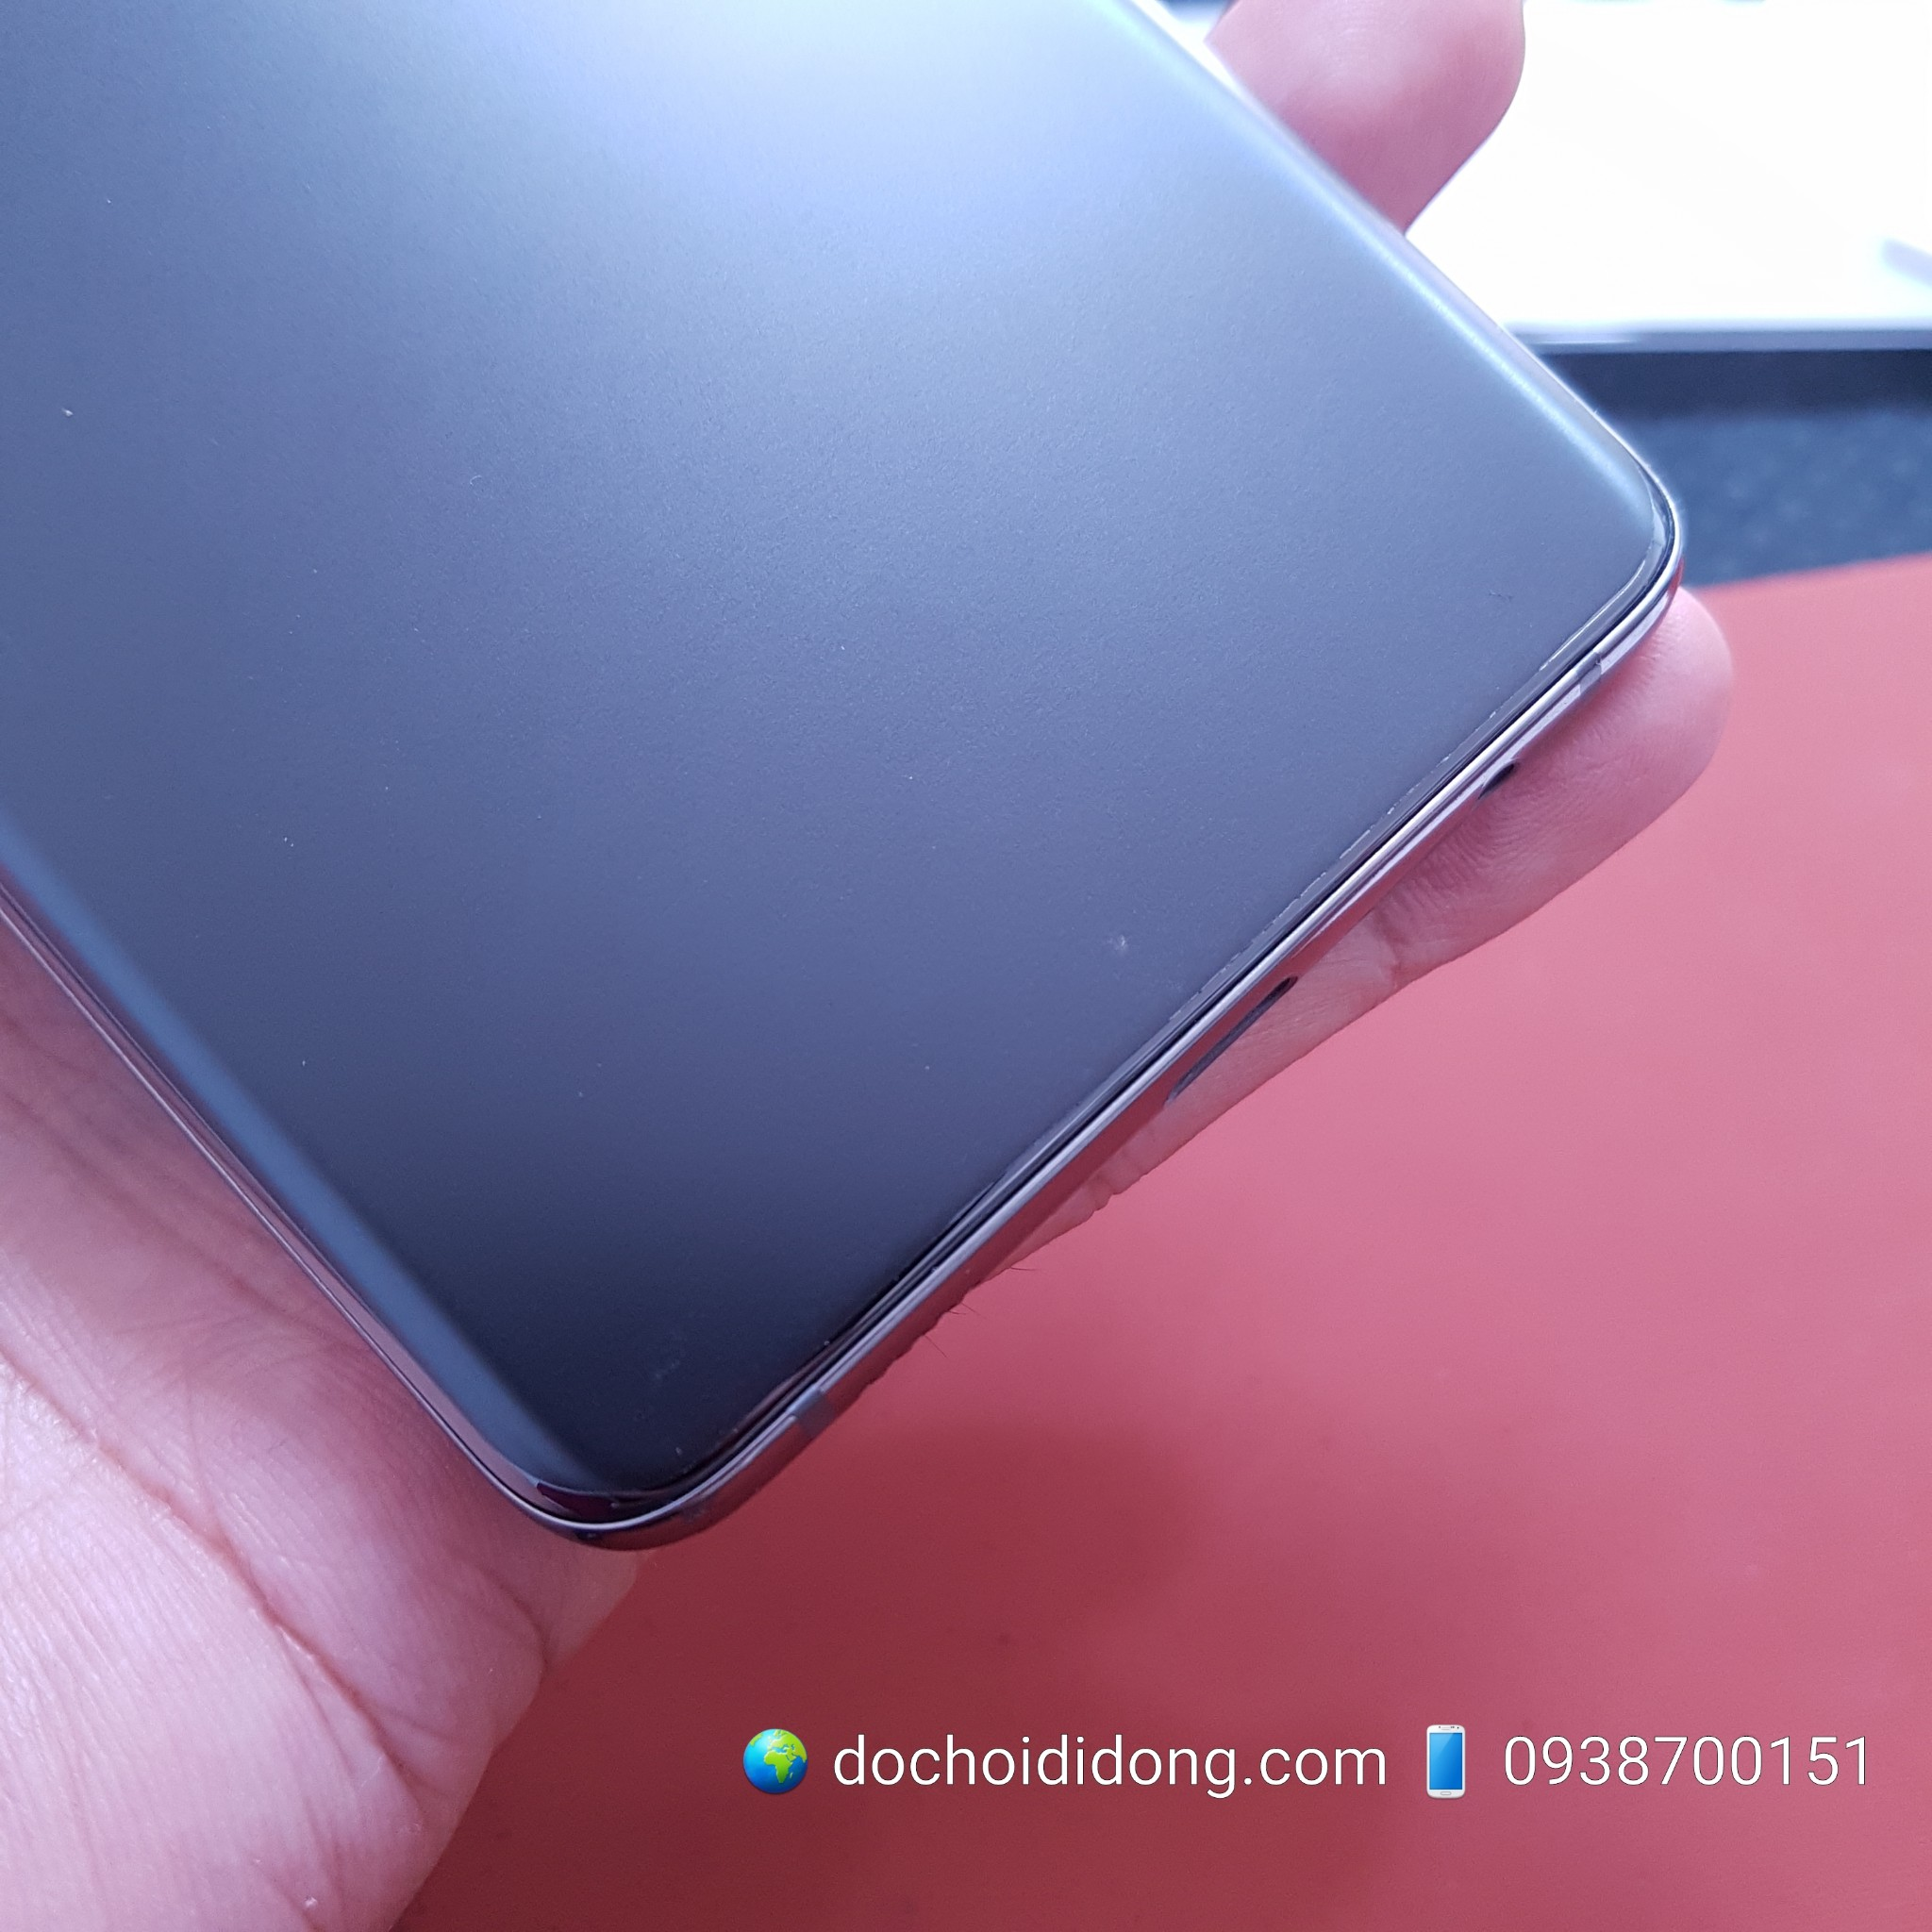 Miếng dán lưng nhám trong Samsung S10 Plus Matte Flexible